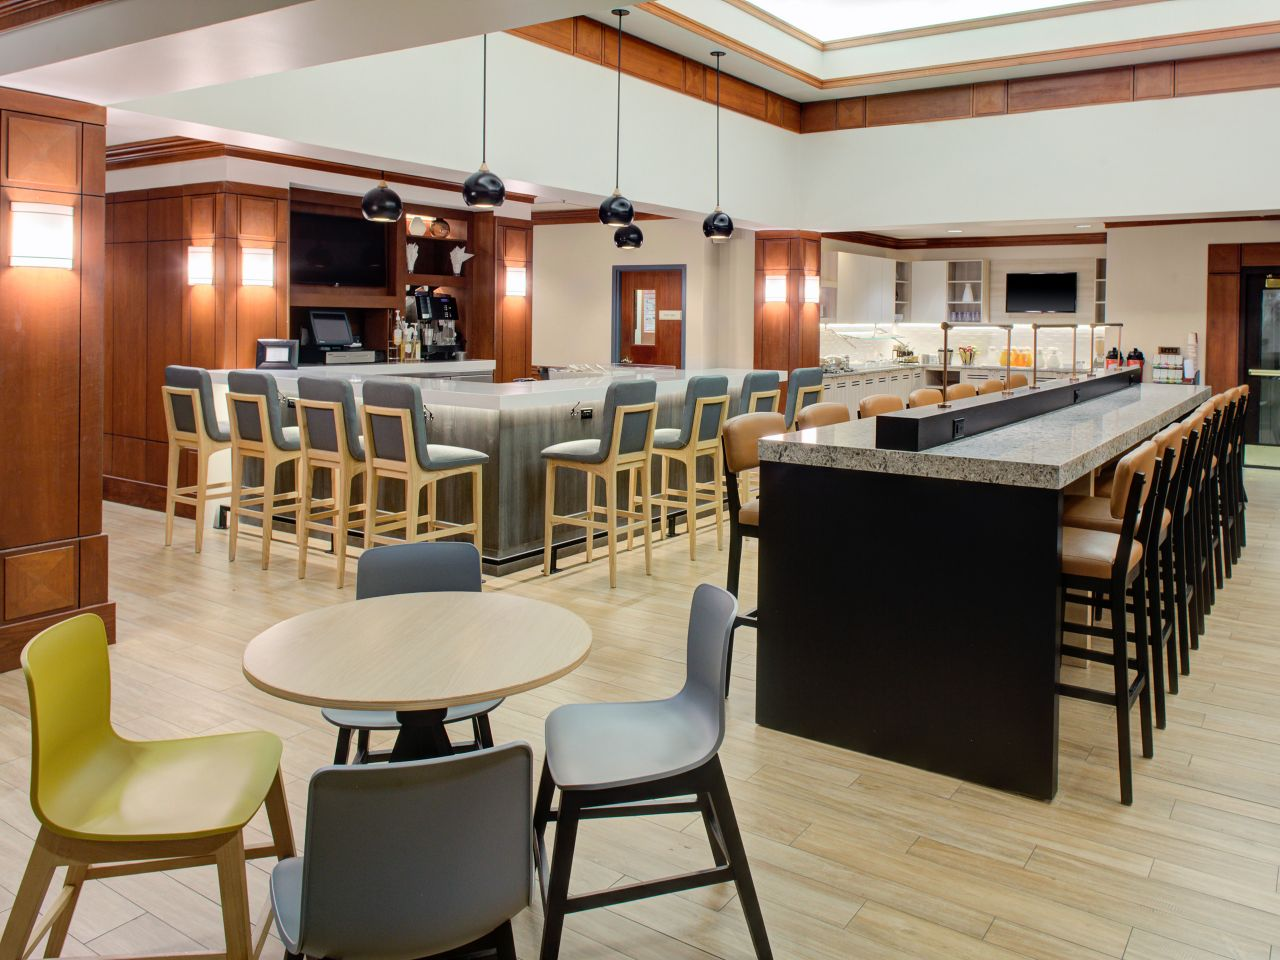 Hyatt House dining area